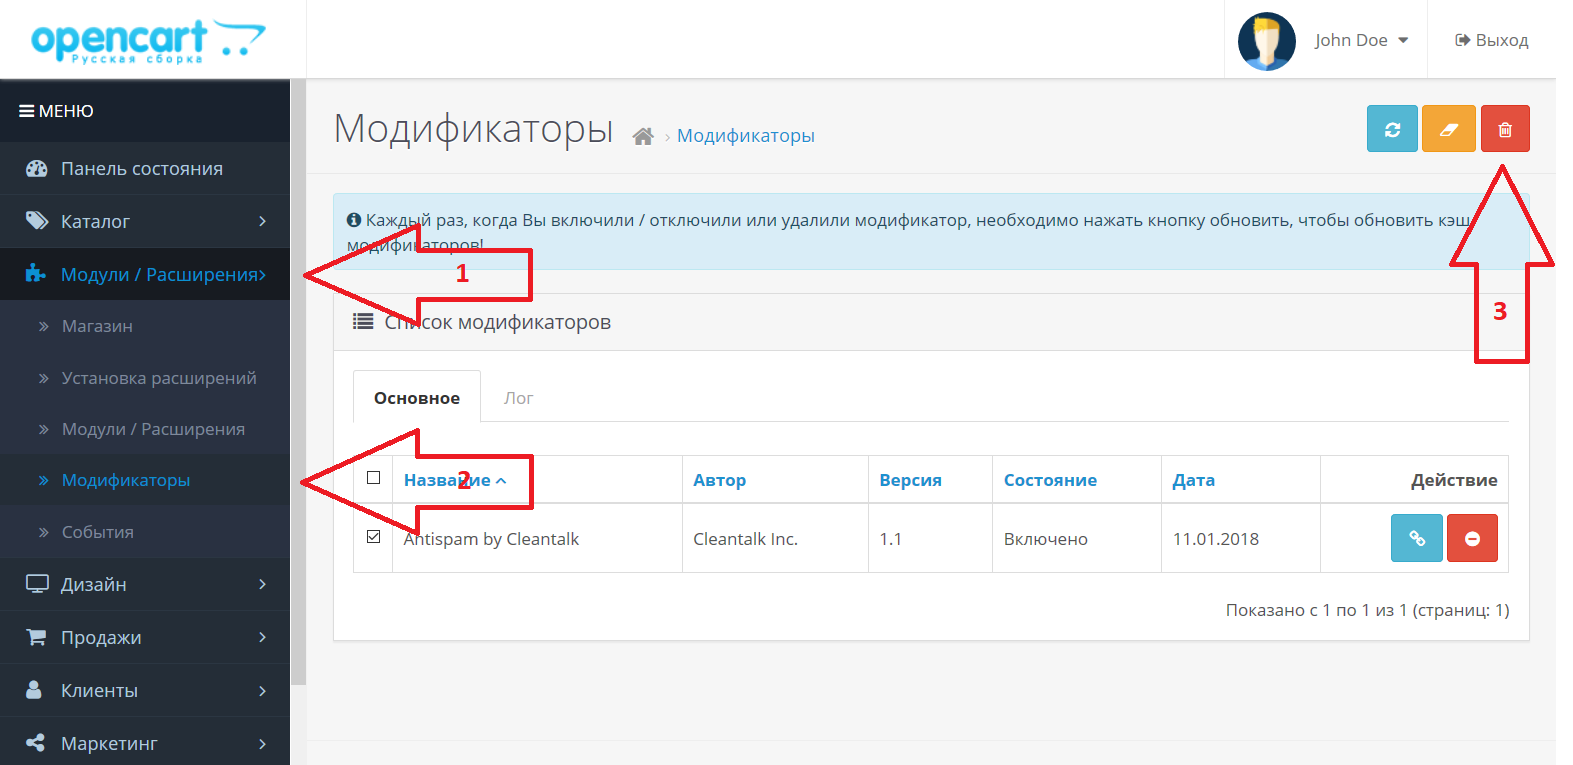 Удаление анти-спам плагина на OpenCart